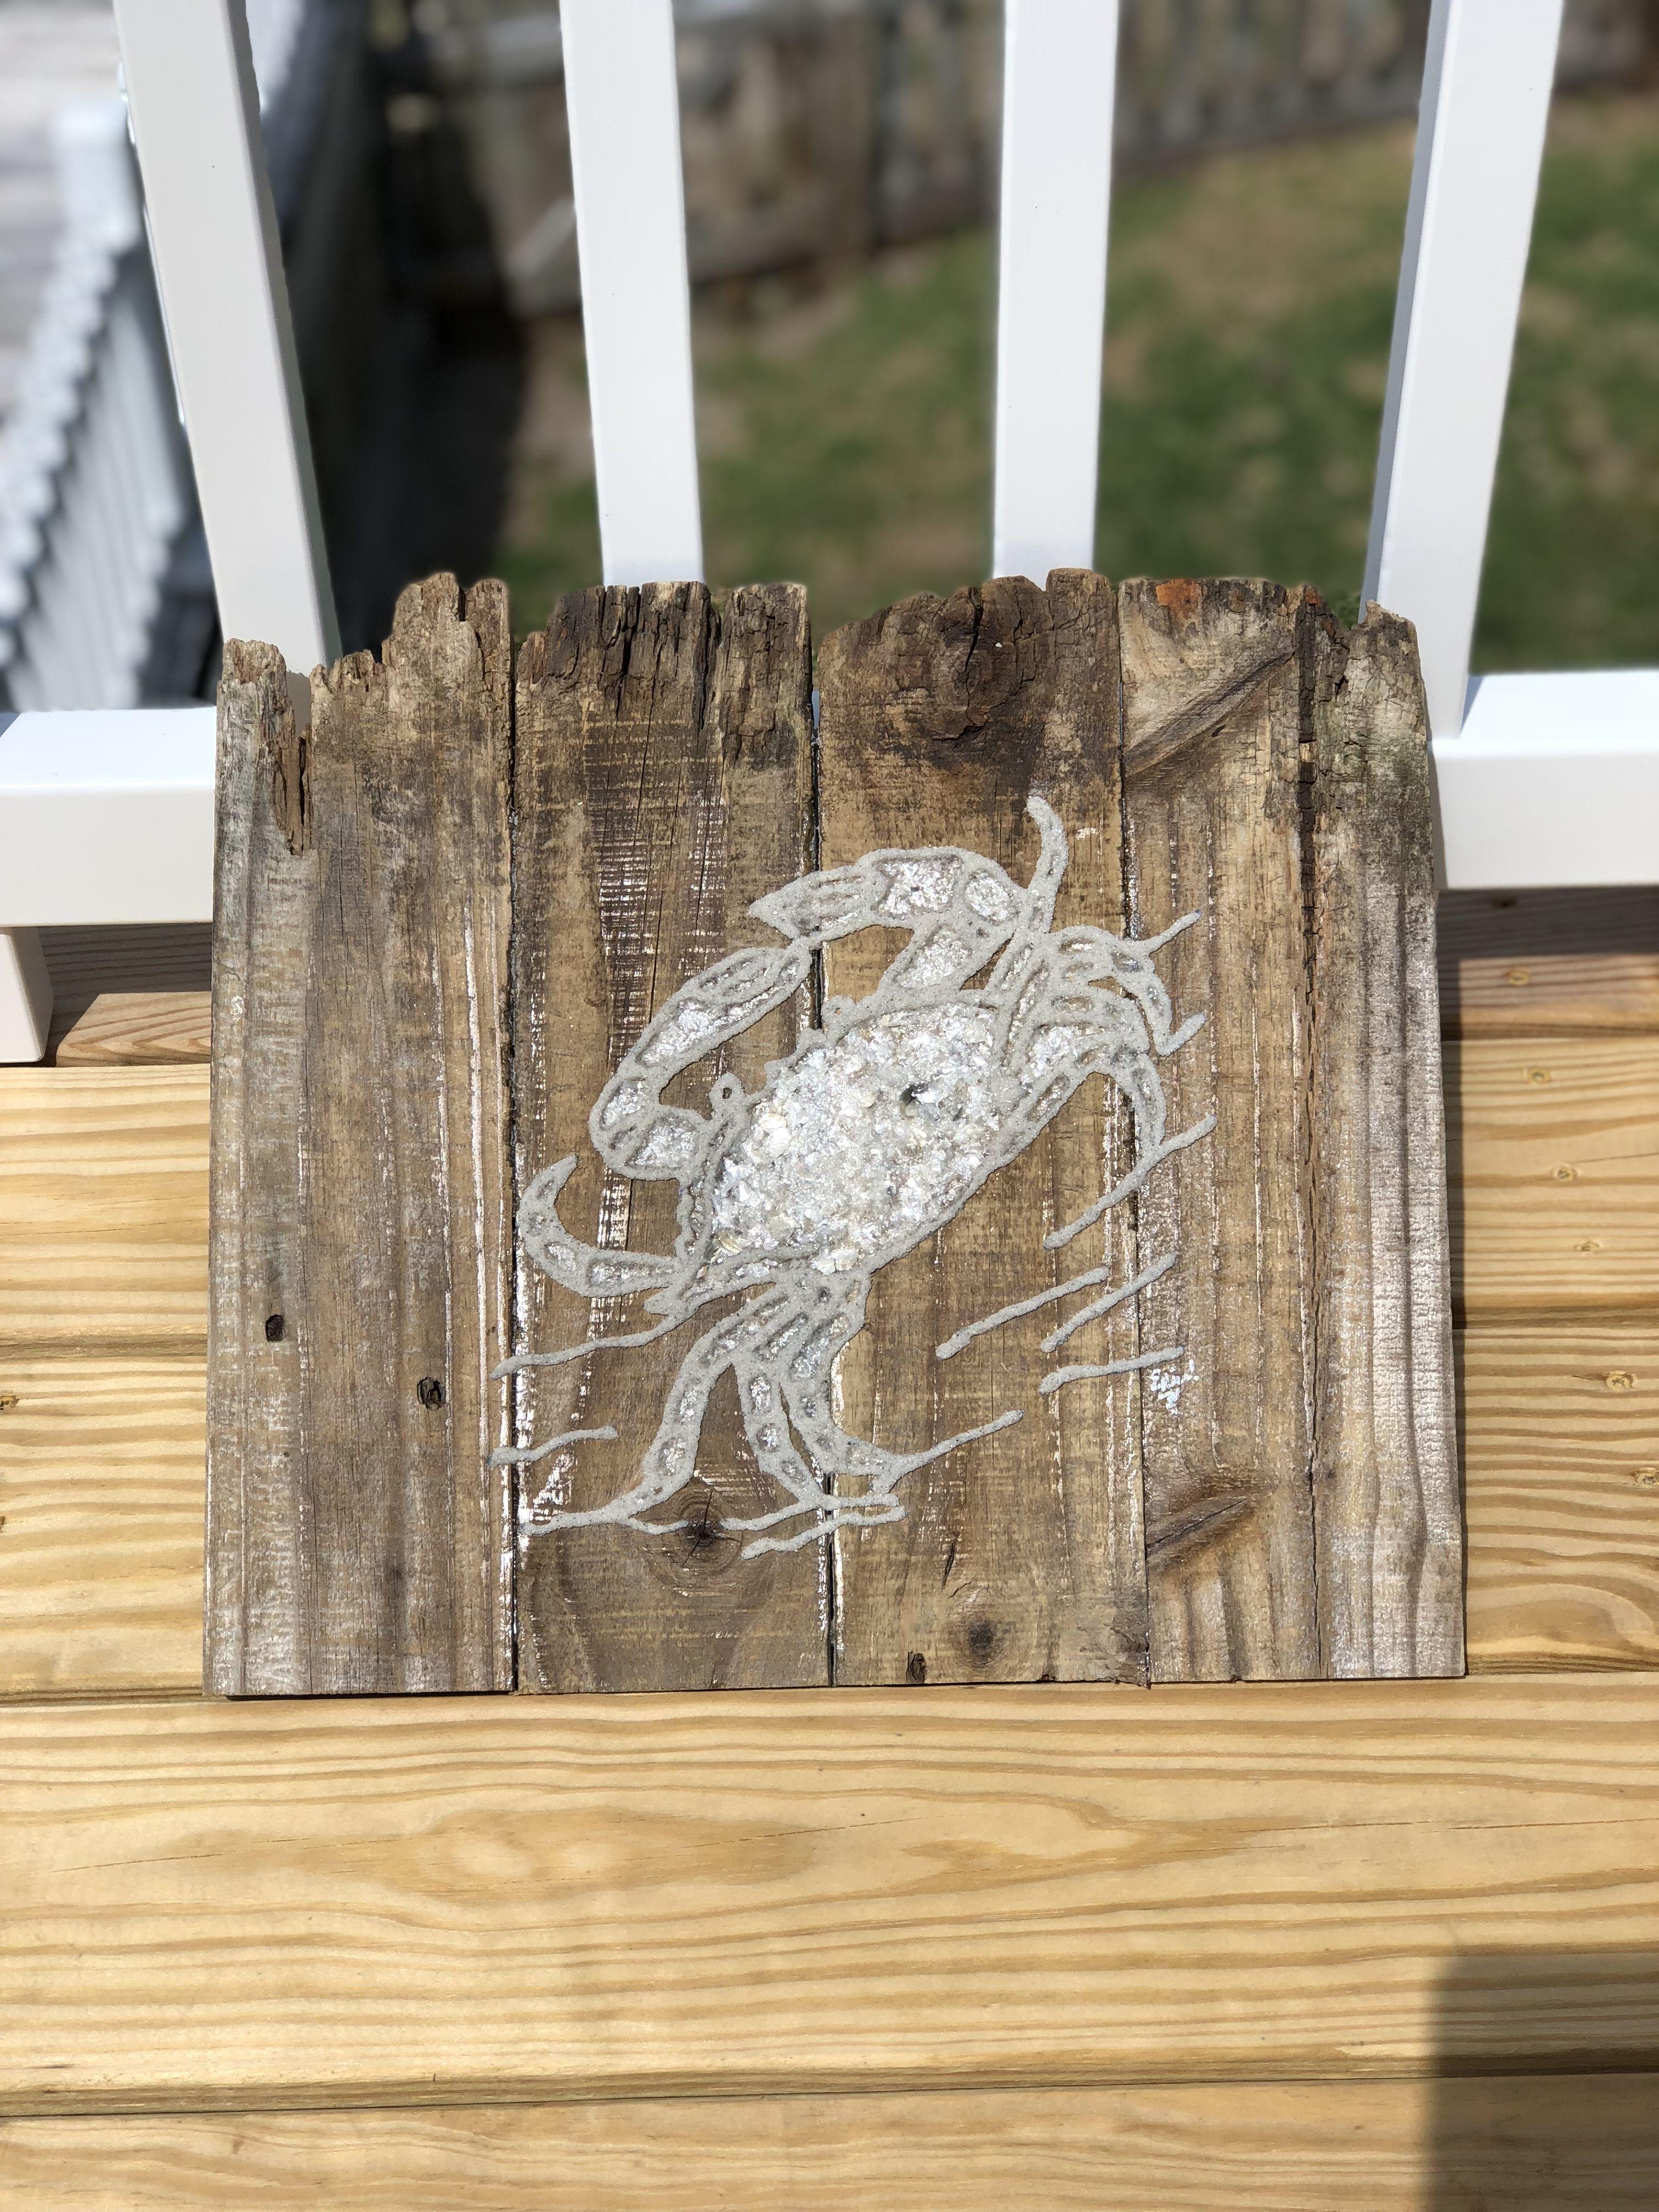 Pin by Erin PrinceGliddon on Stuff I make!!!! How to make